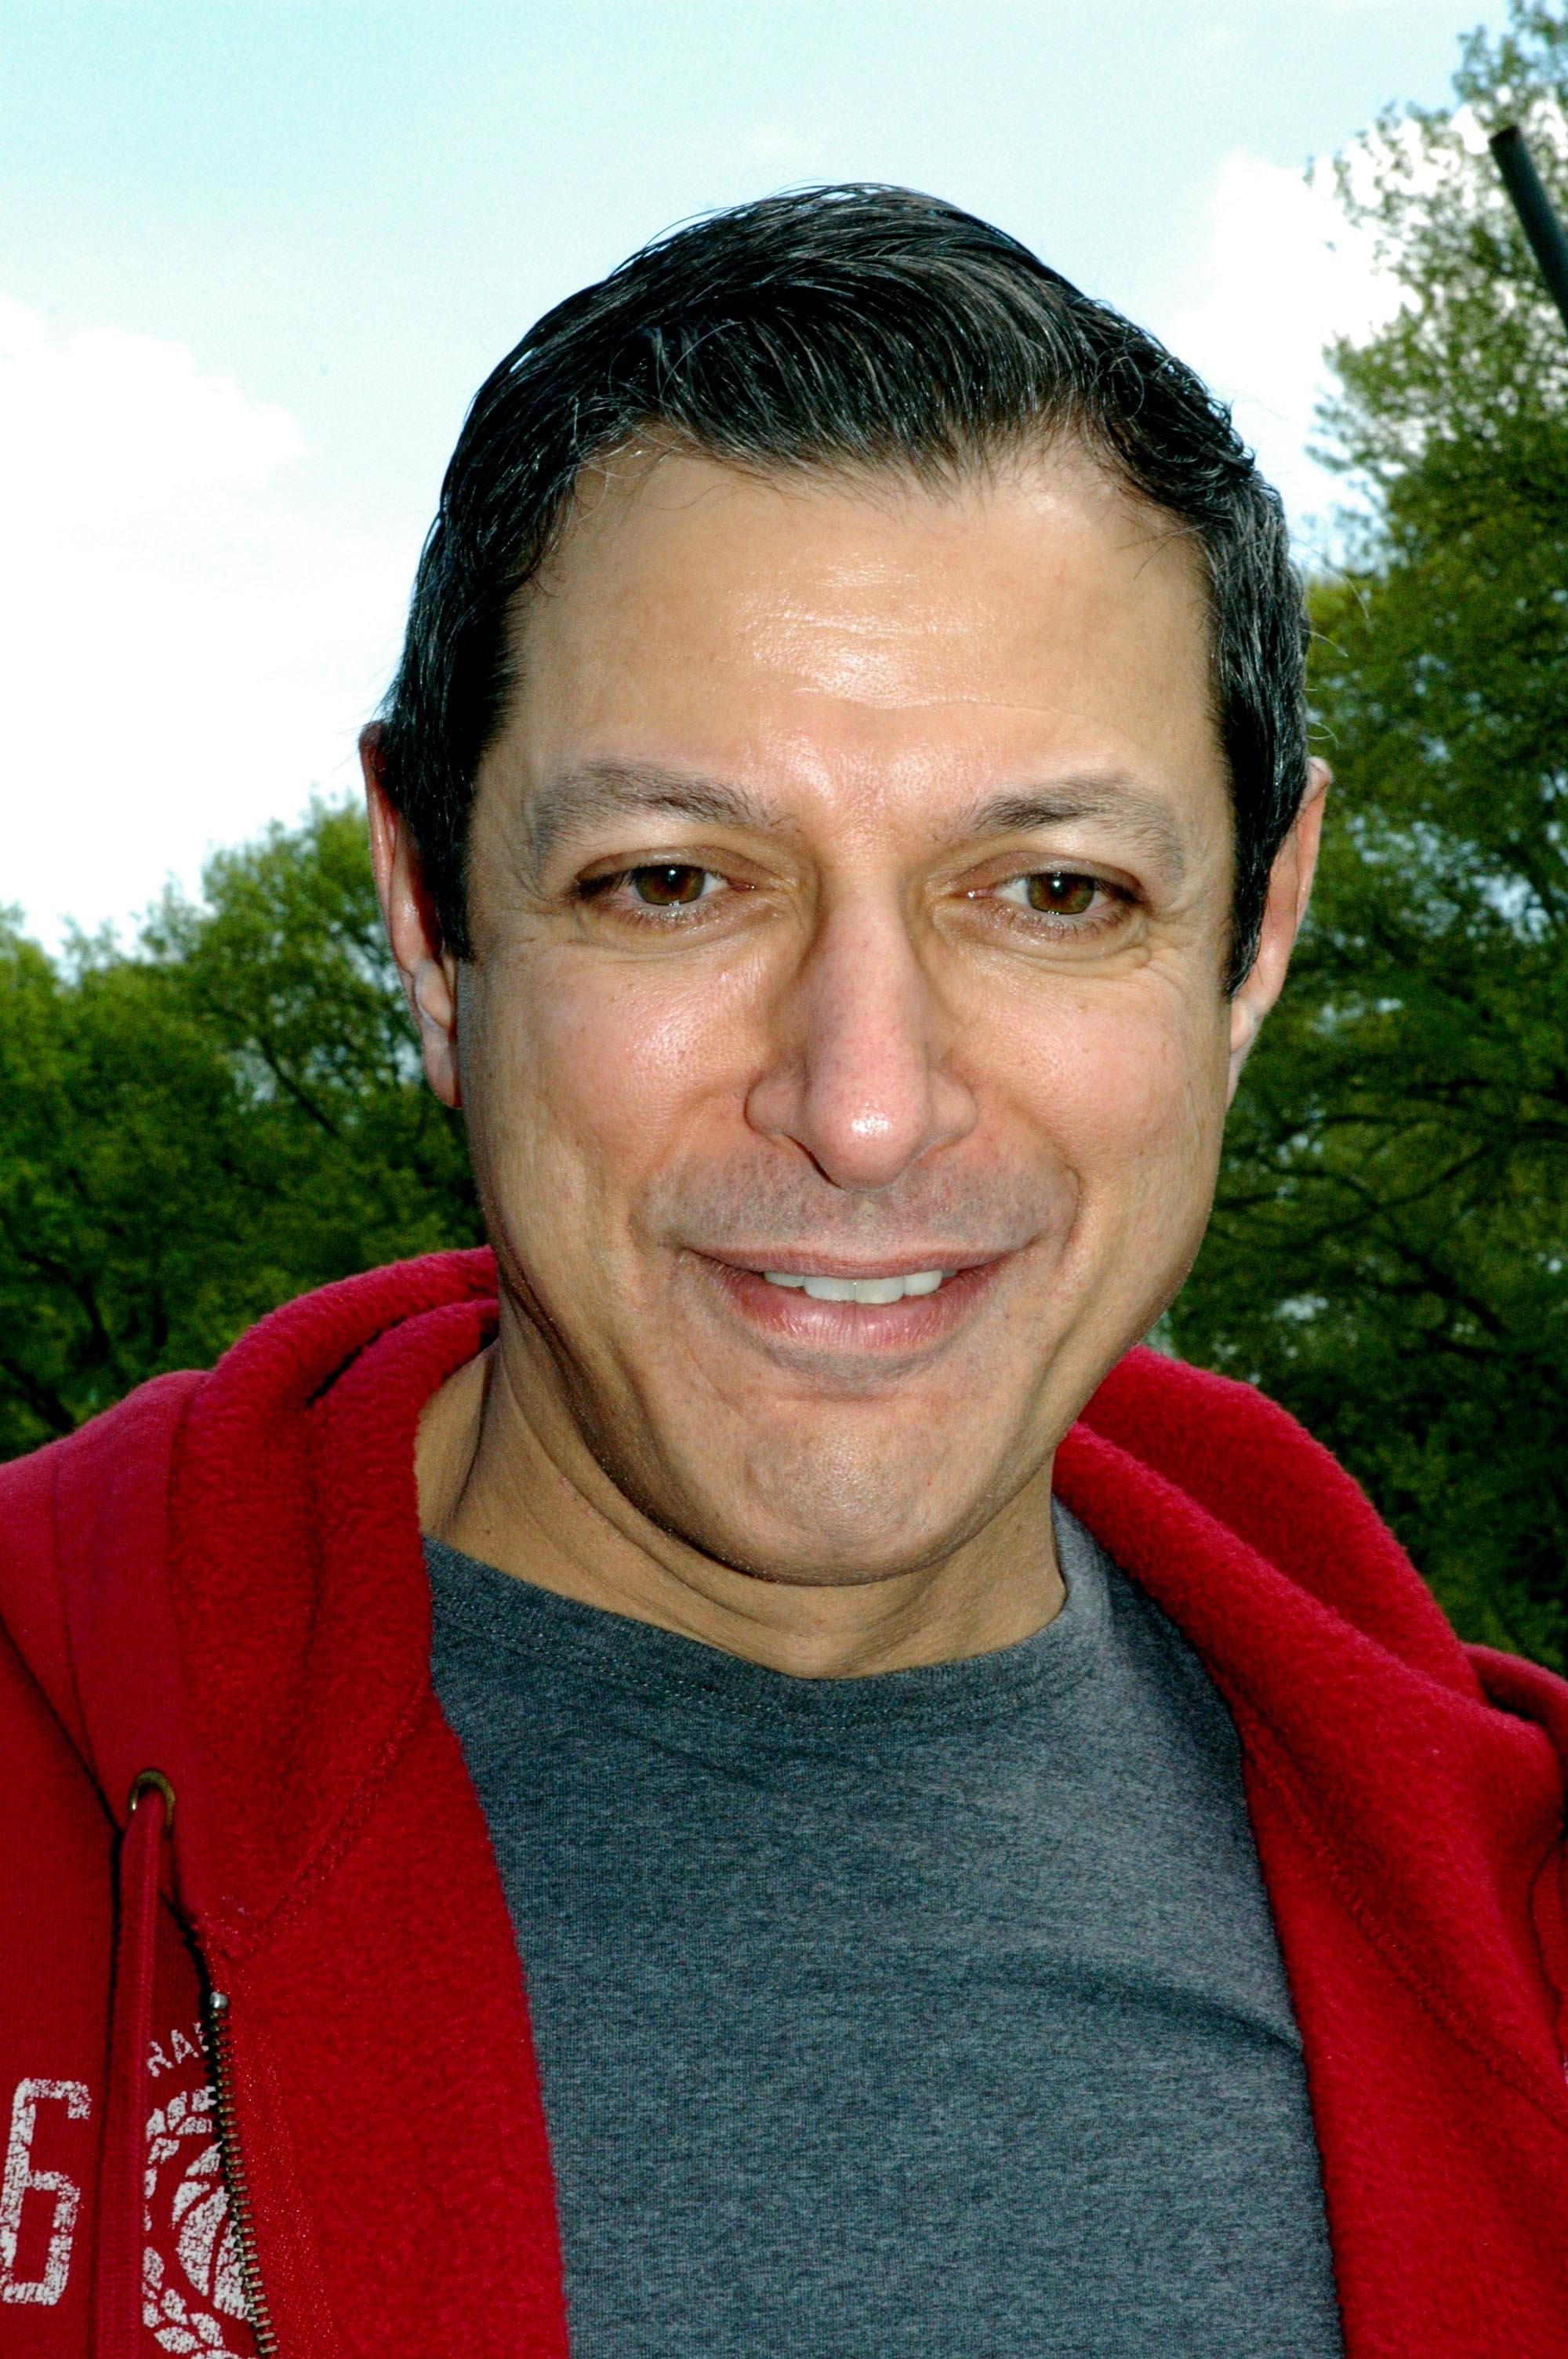 Jeff Goldblum  01  DSC_5470.jpg